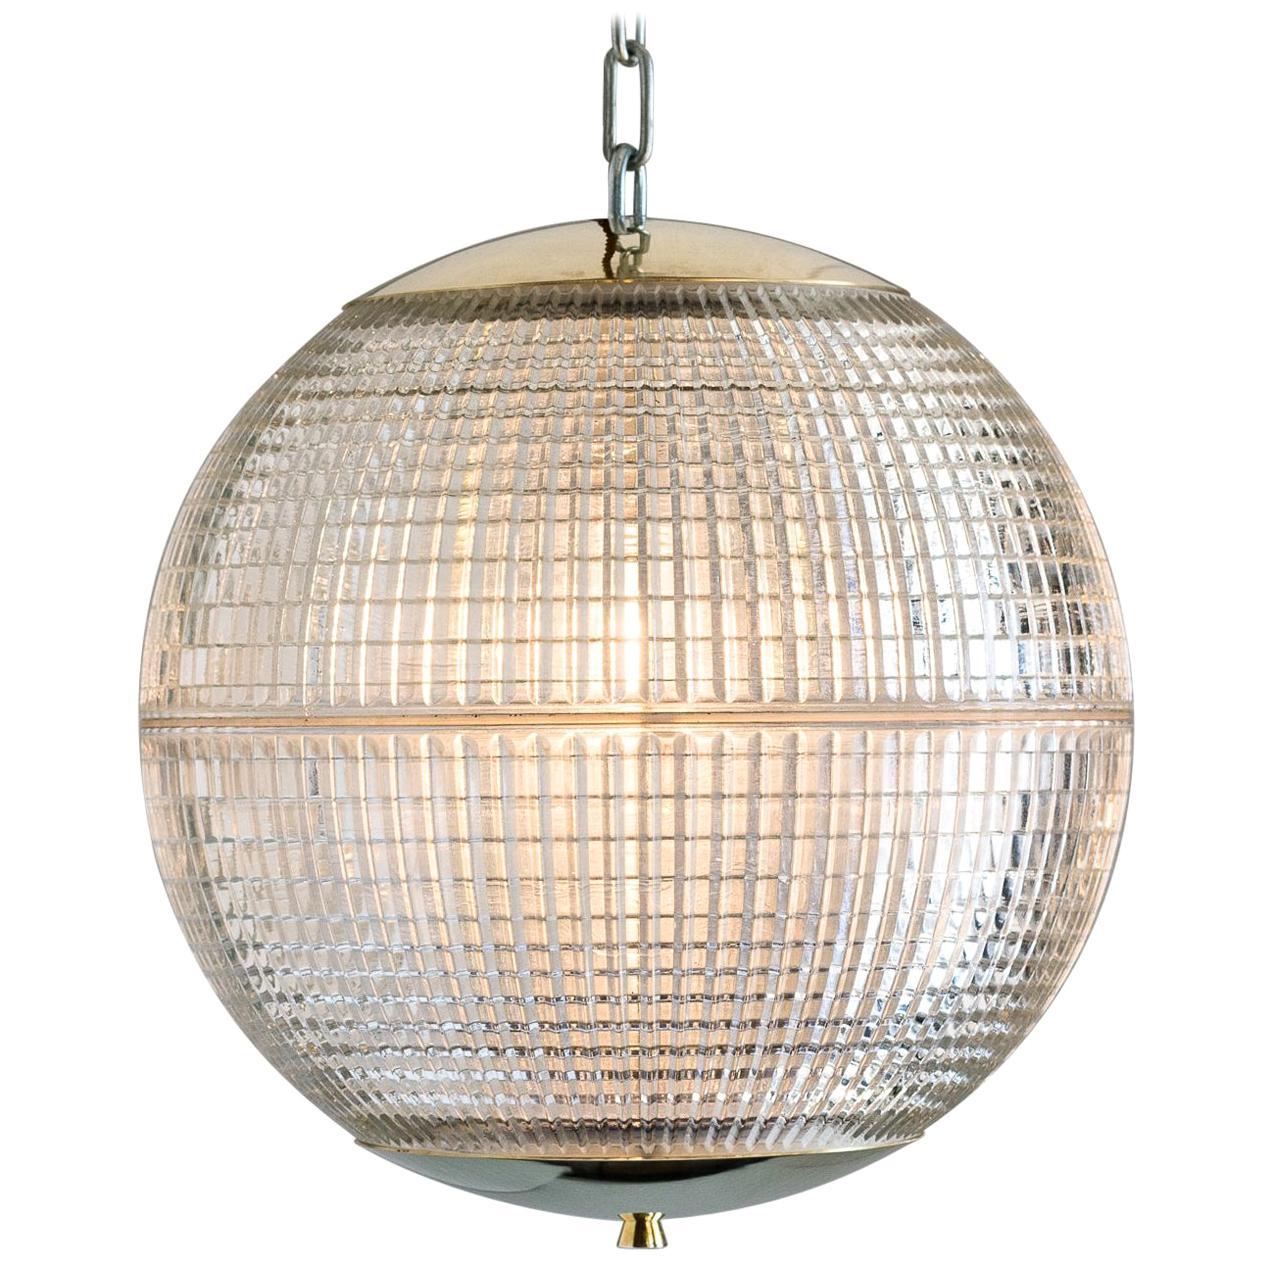 Small French Holophane Globe Pendant Lights